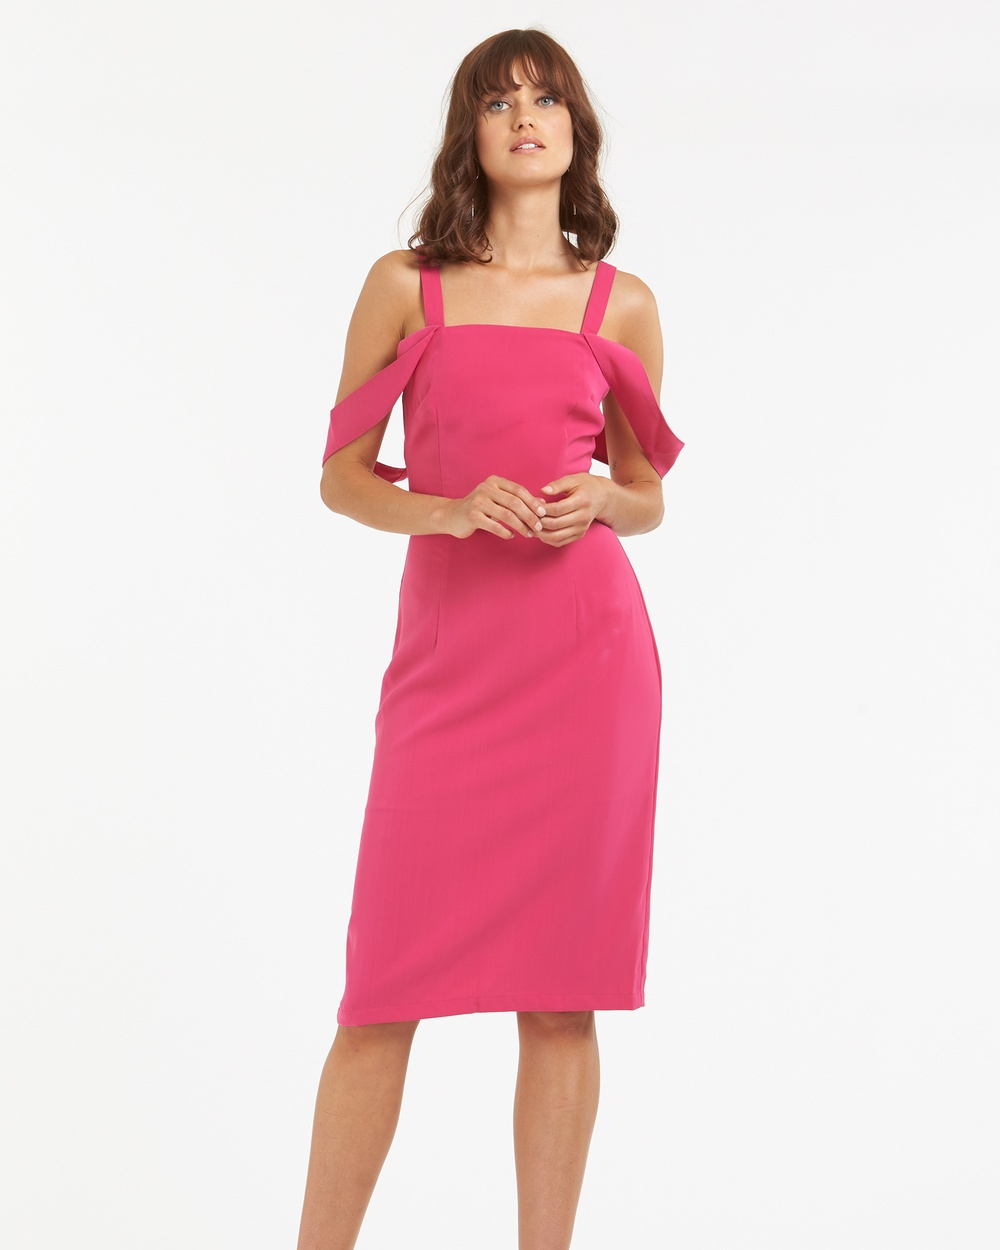 Amelius Cosmo Dress Dresses Fuschia Cosmo Dress